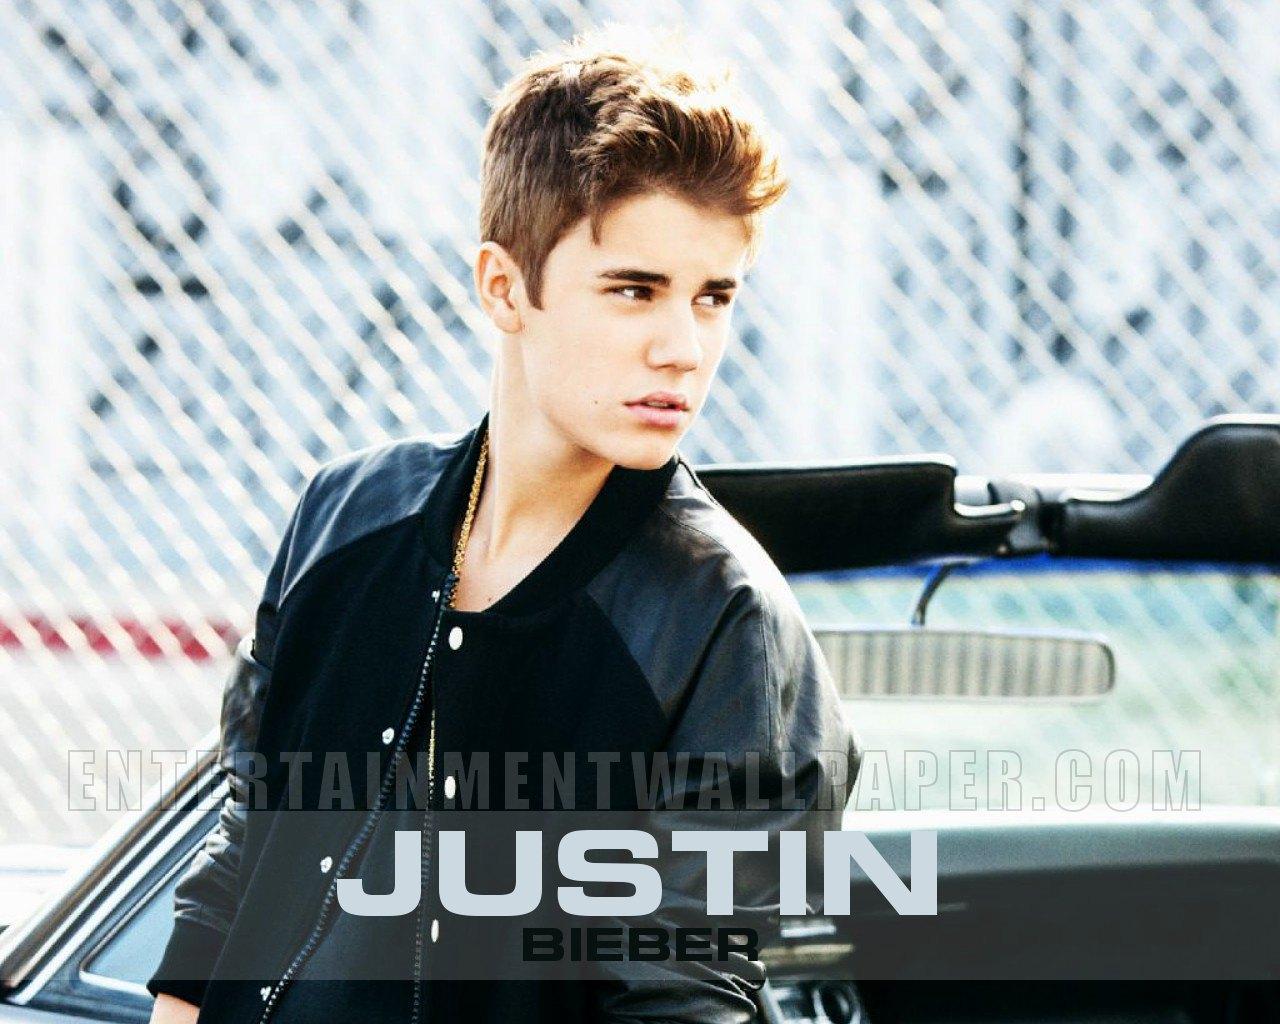 Download Justin Bieber Wallpaper